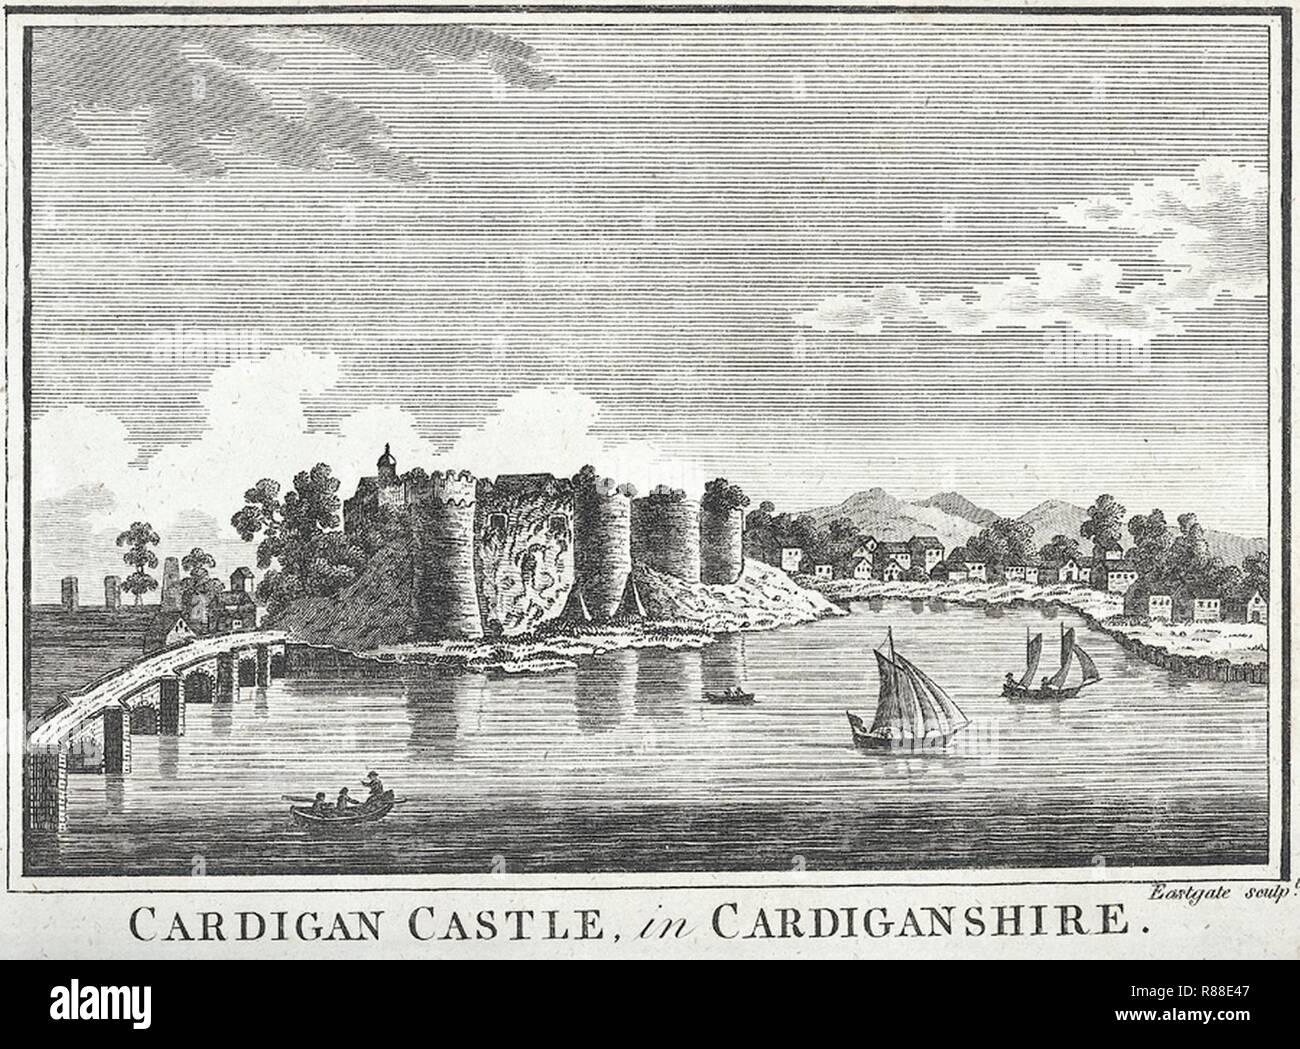 Cardigan Castle, in Cardiganshire. - Stock Image